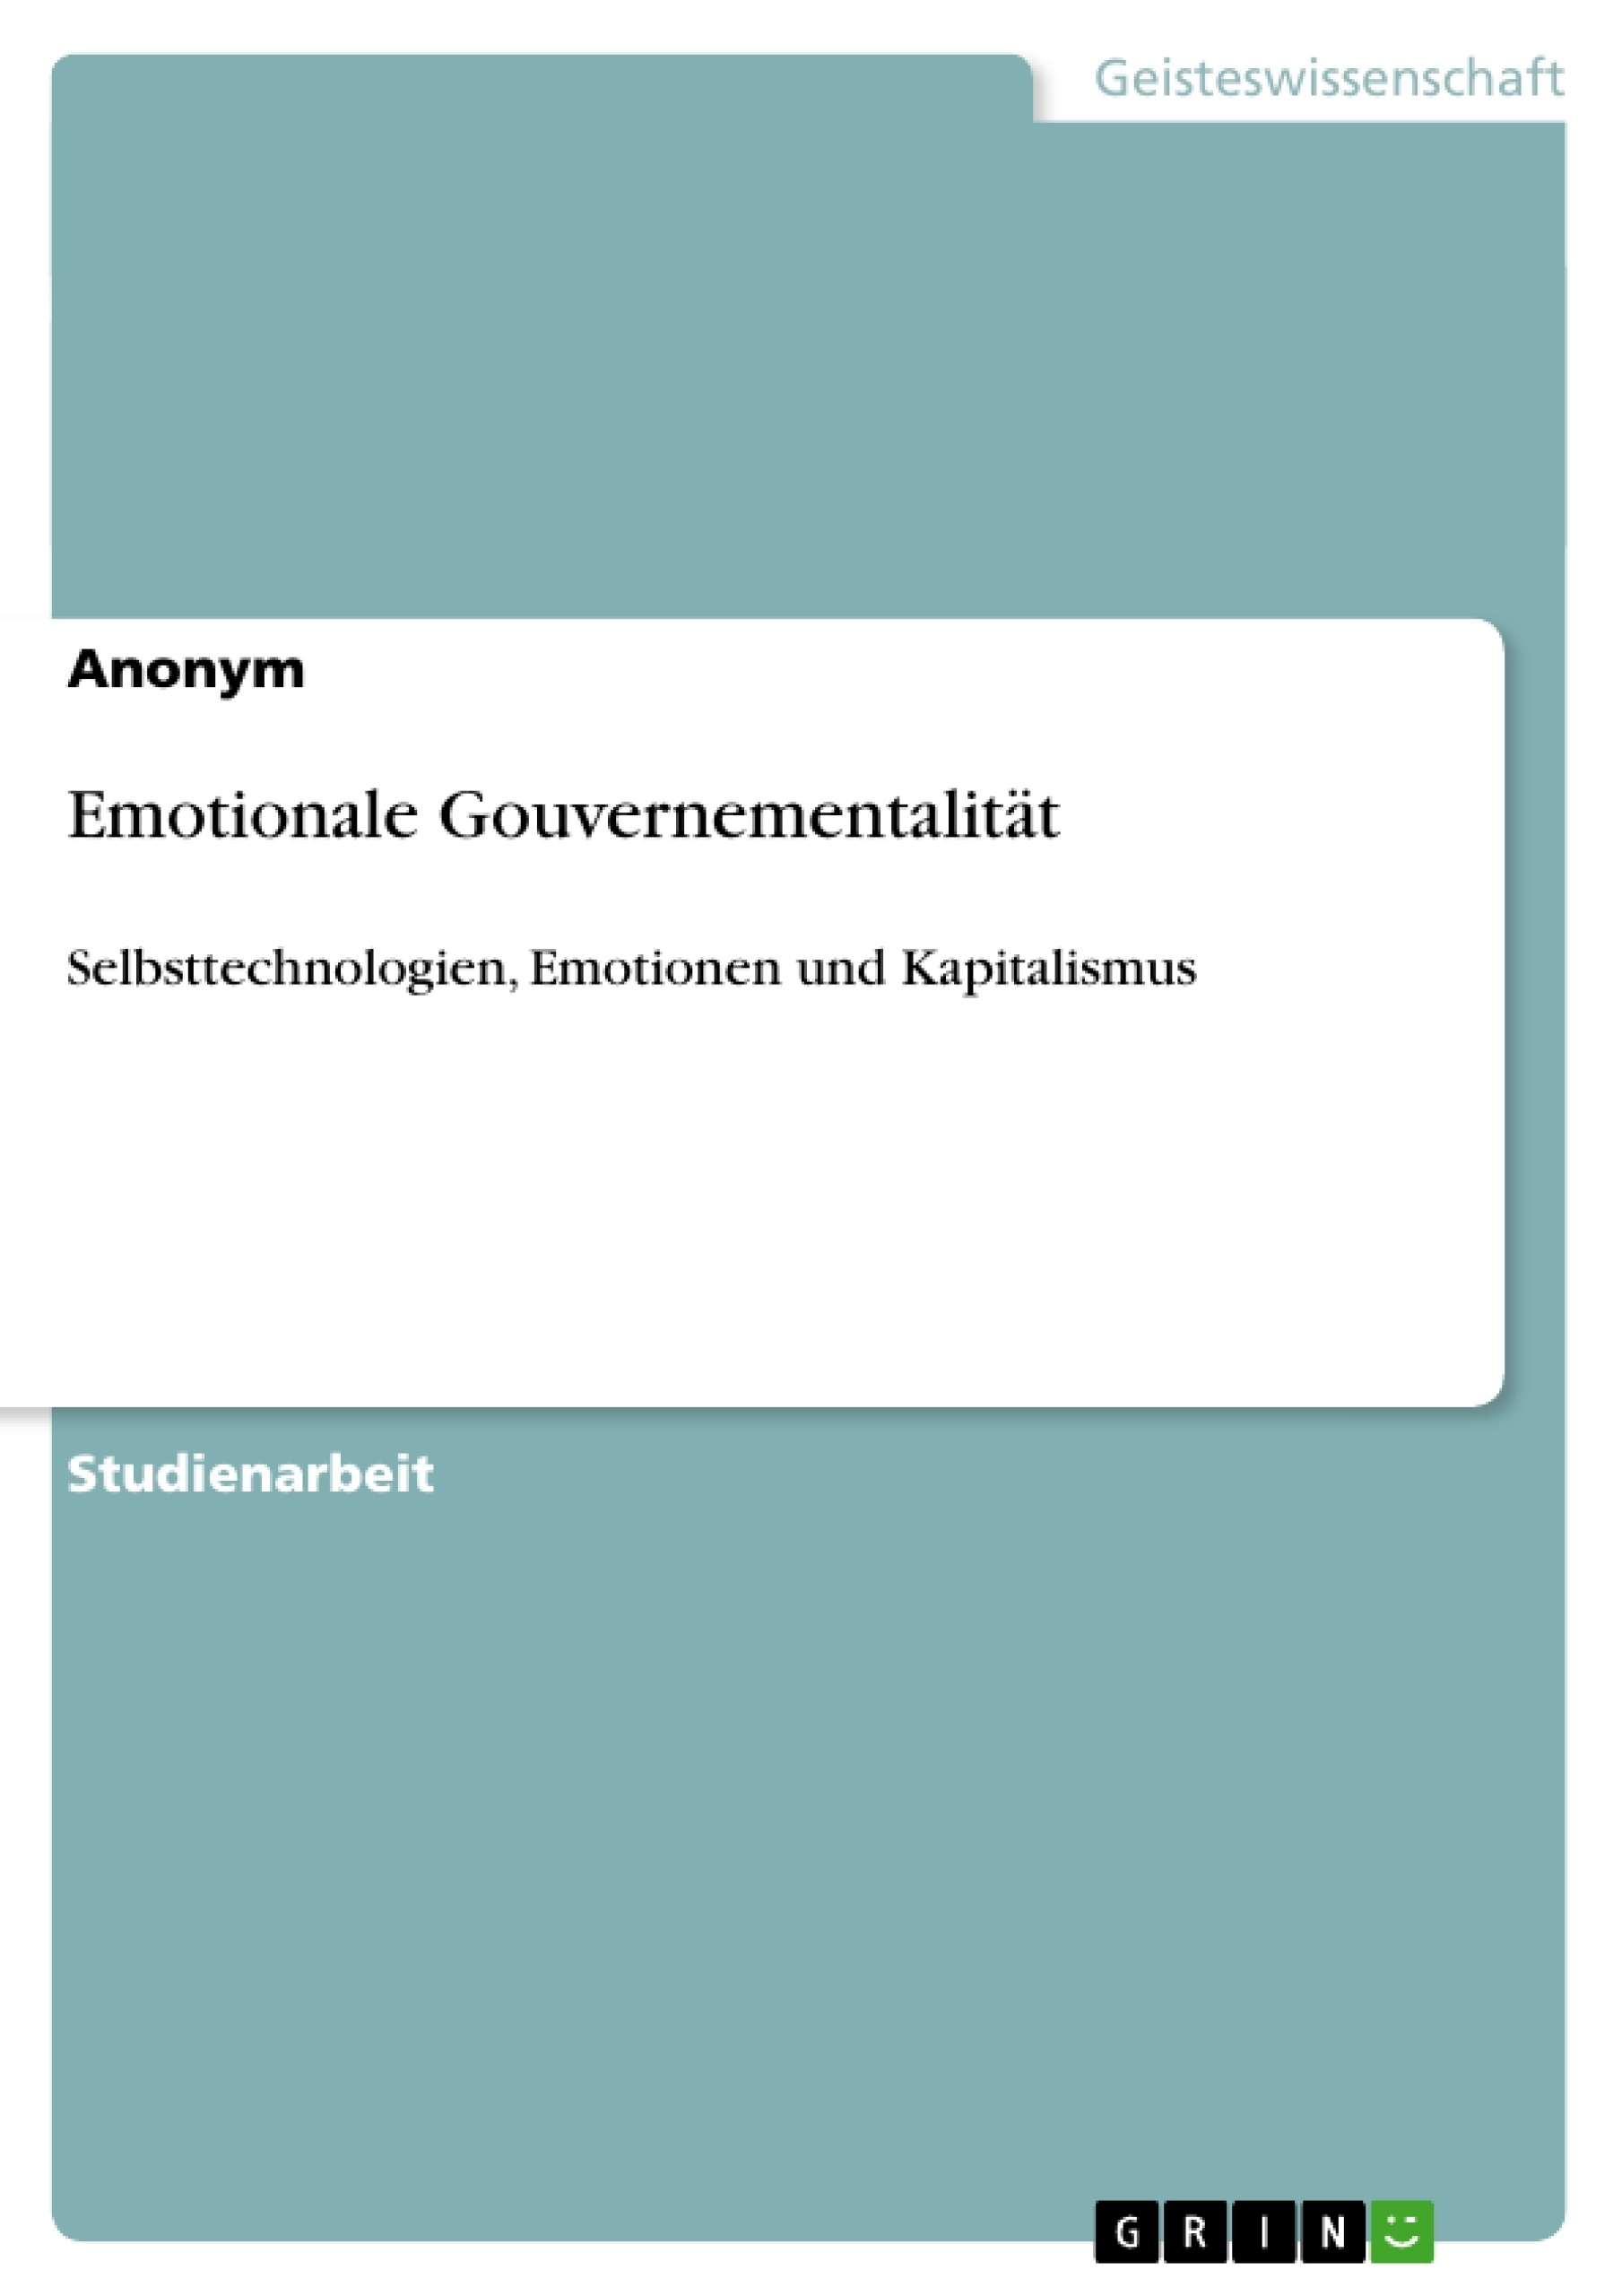 Titel: Emotionale Gouvernementalität